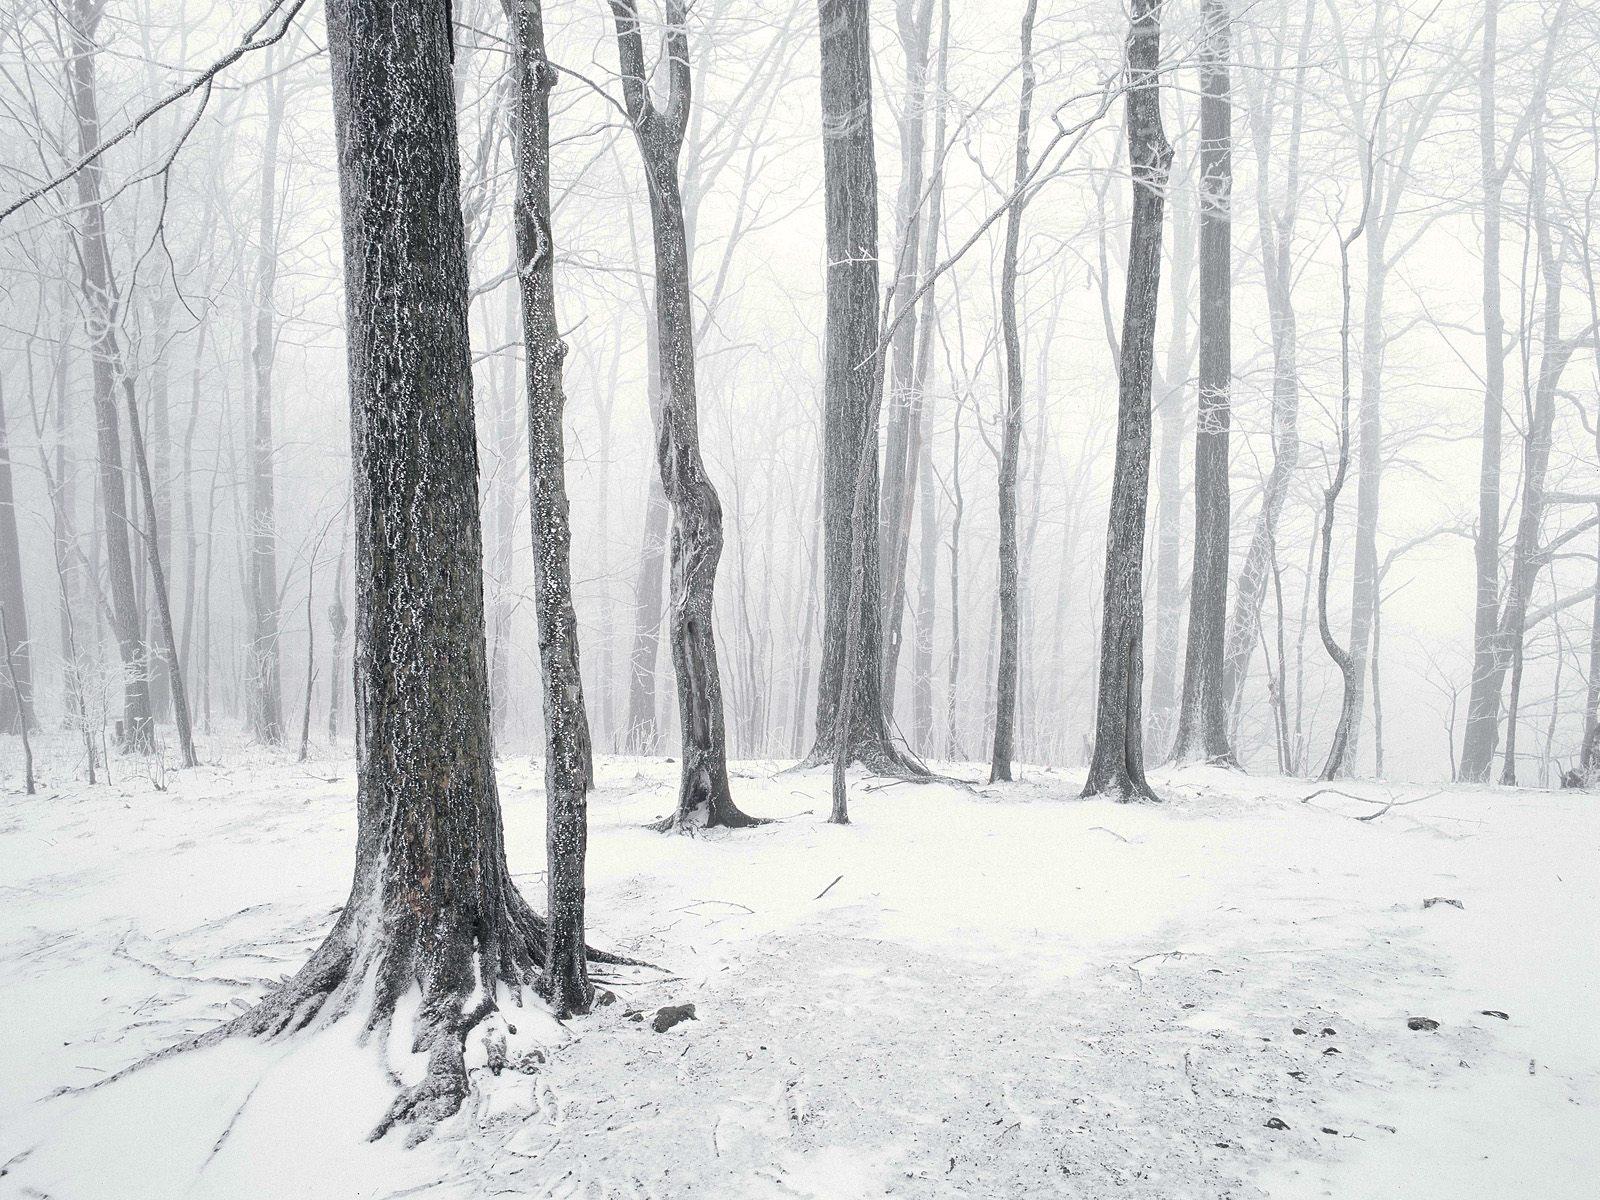 Зимний лес, снег, деревья, обои на рабочий стол